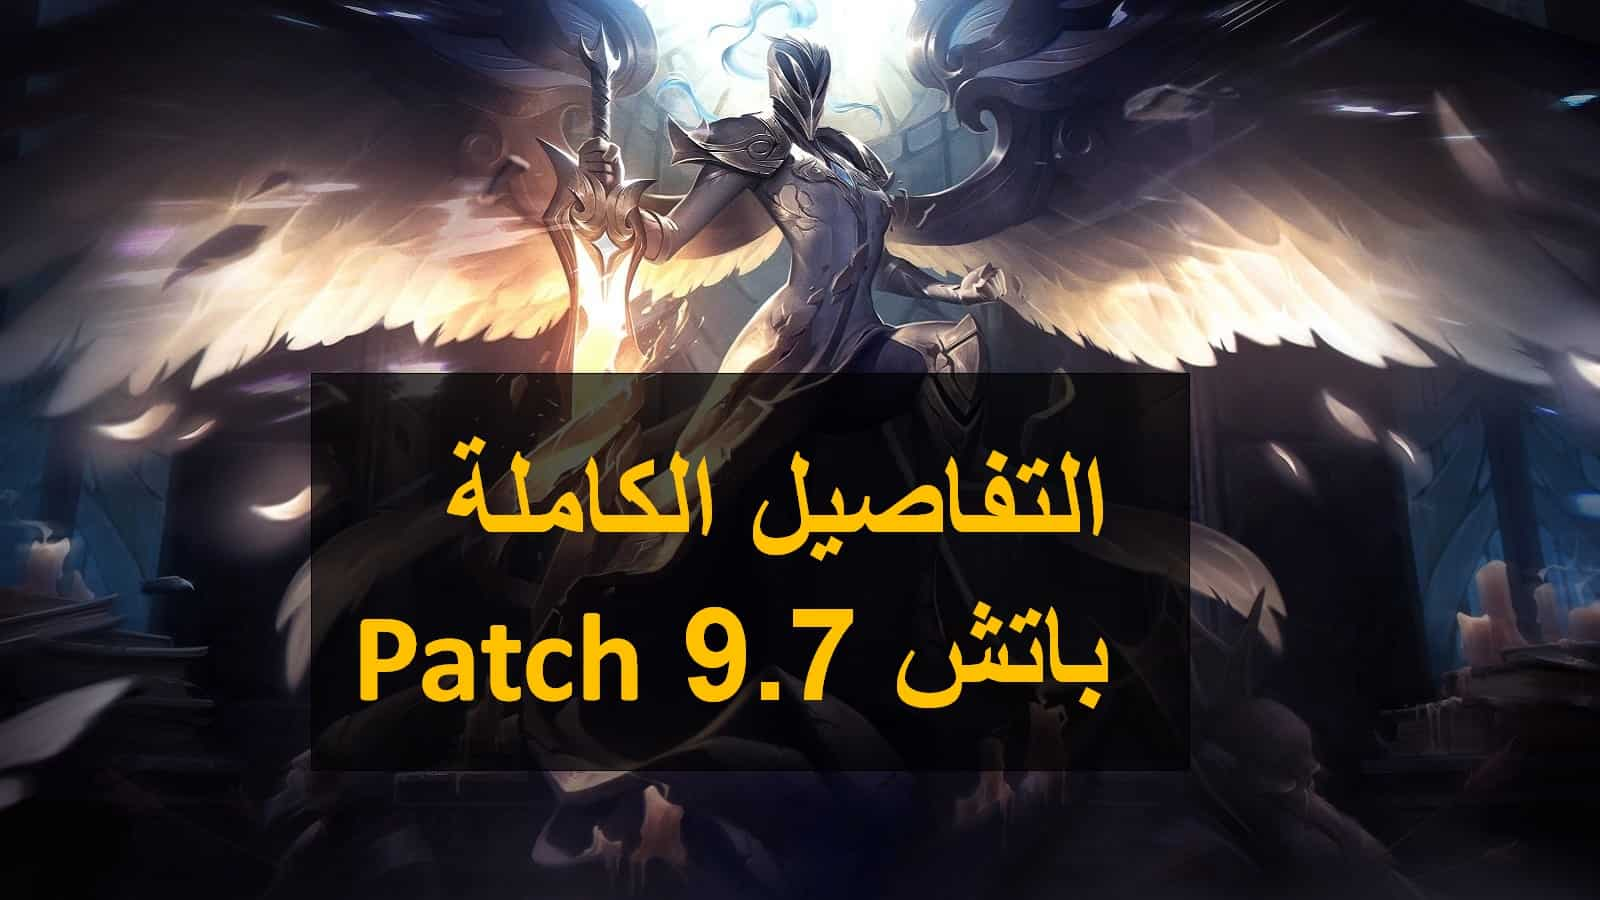 patch lol 9